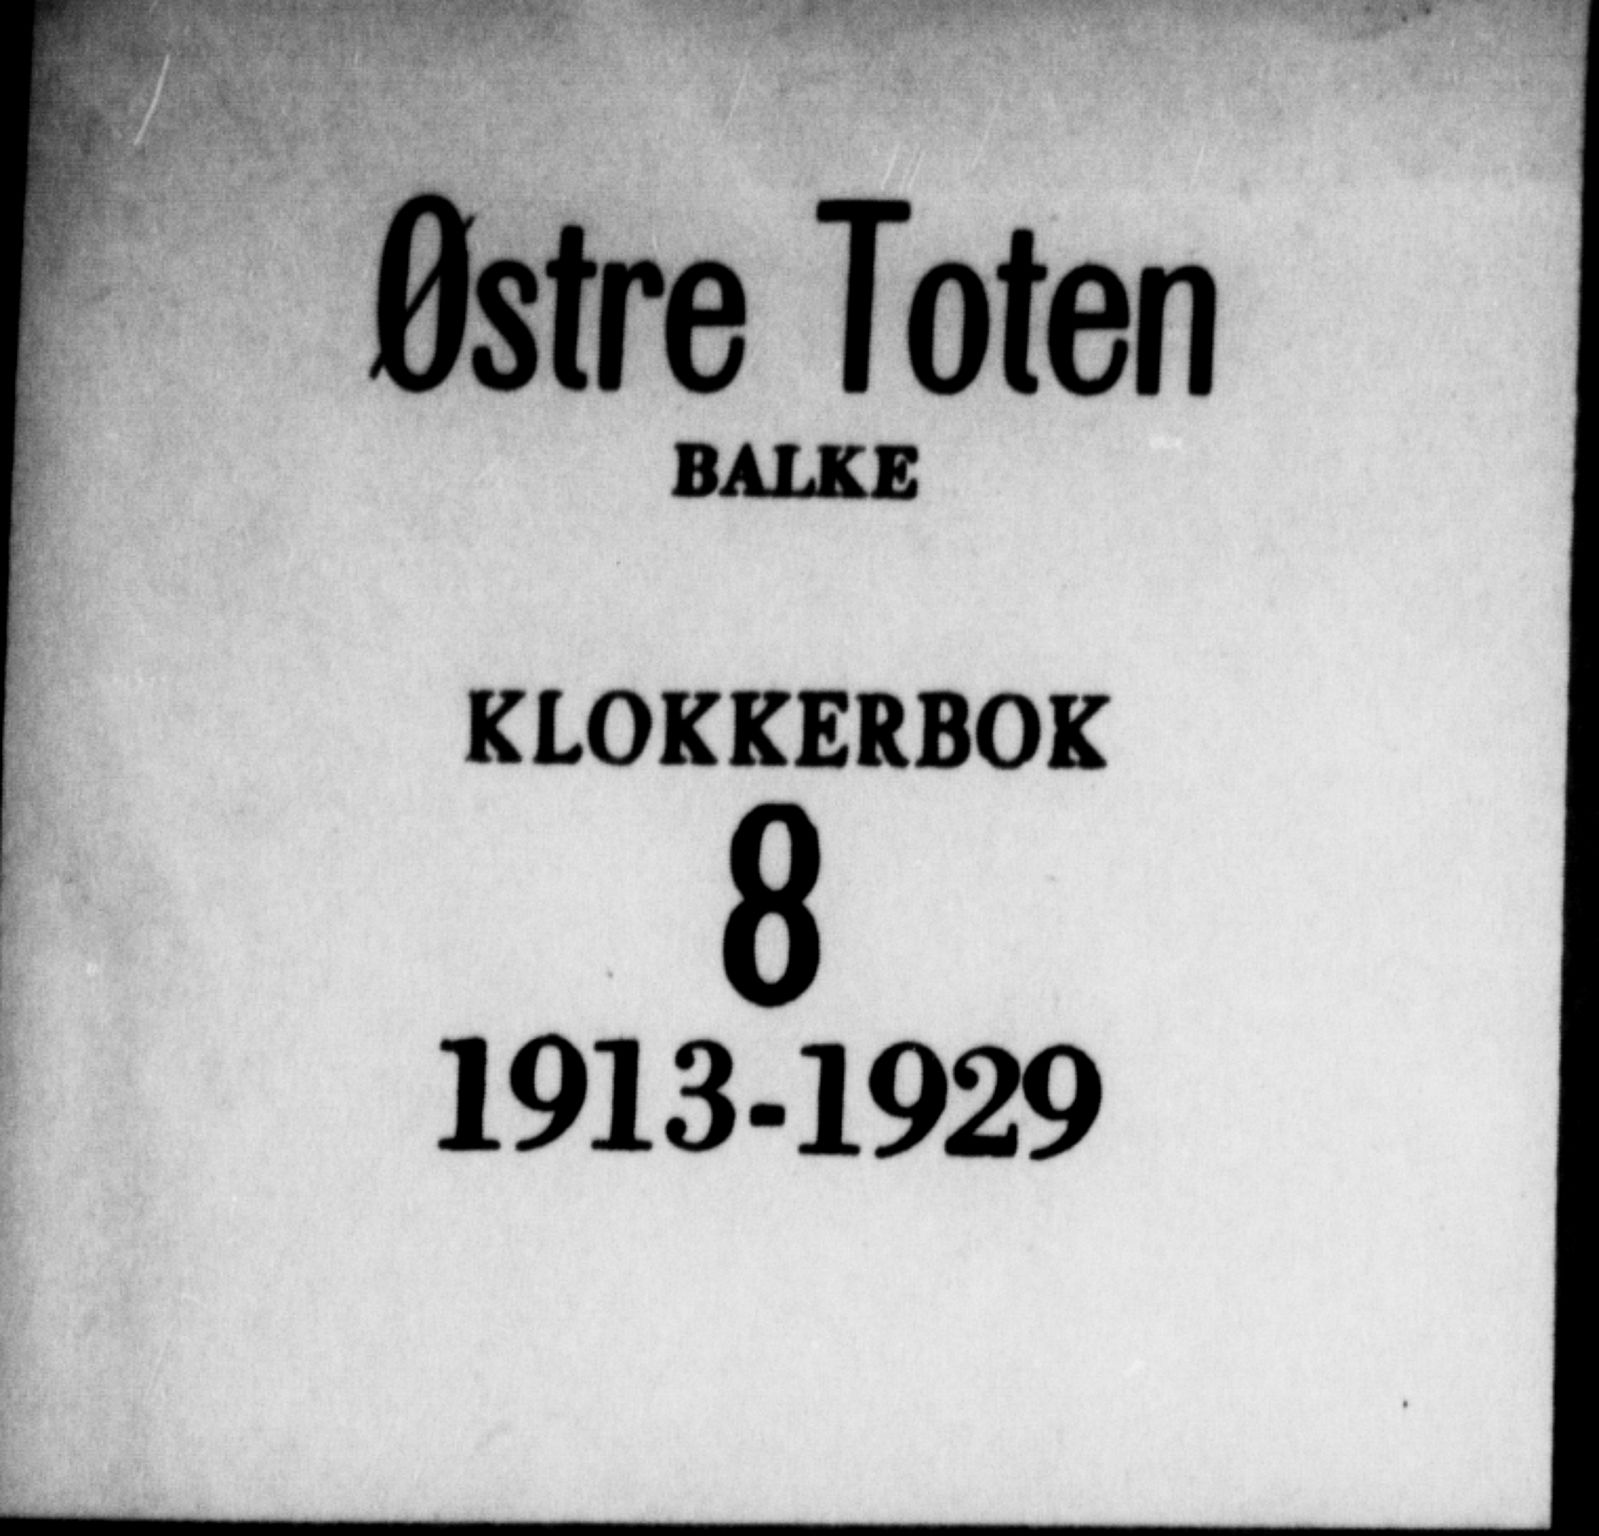 SAH, Østre Toten prestekontor, Klokkerbok nr. 8, 1913-1929